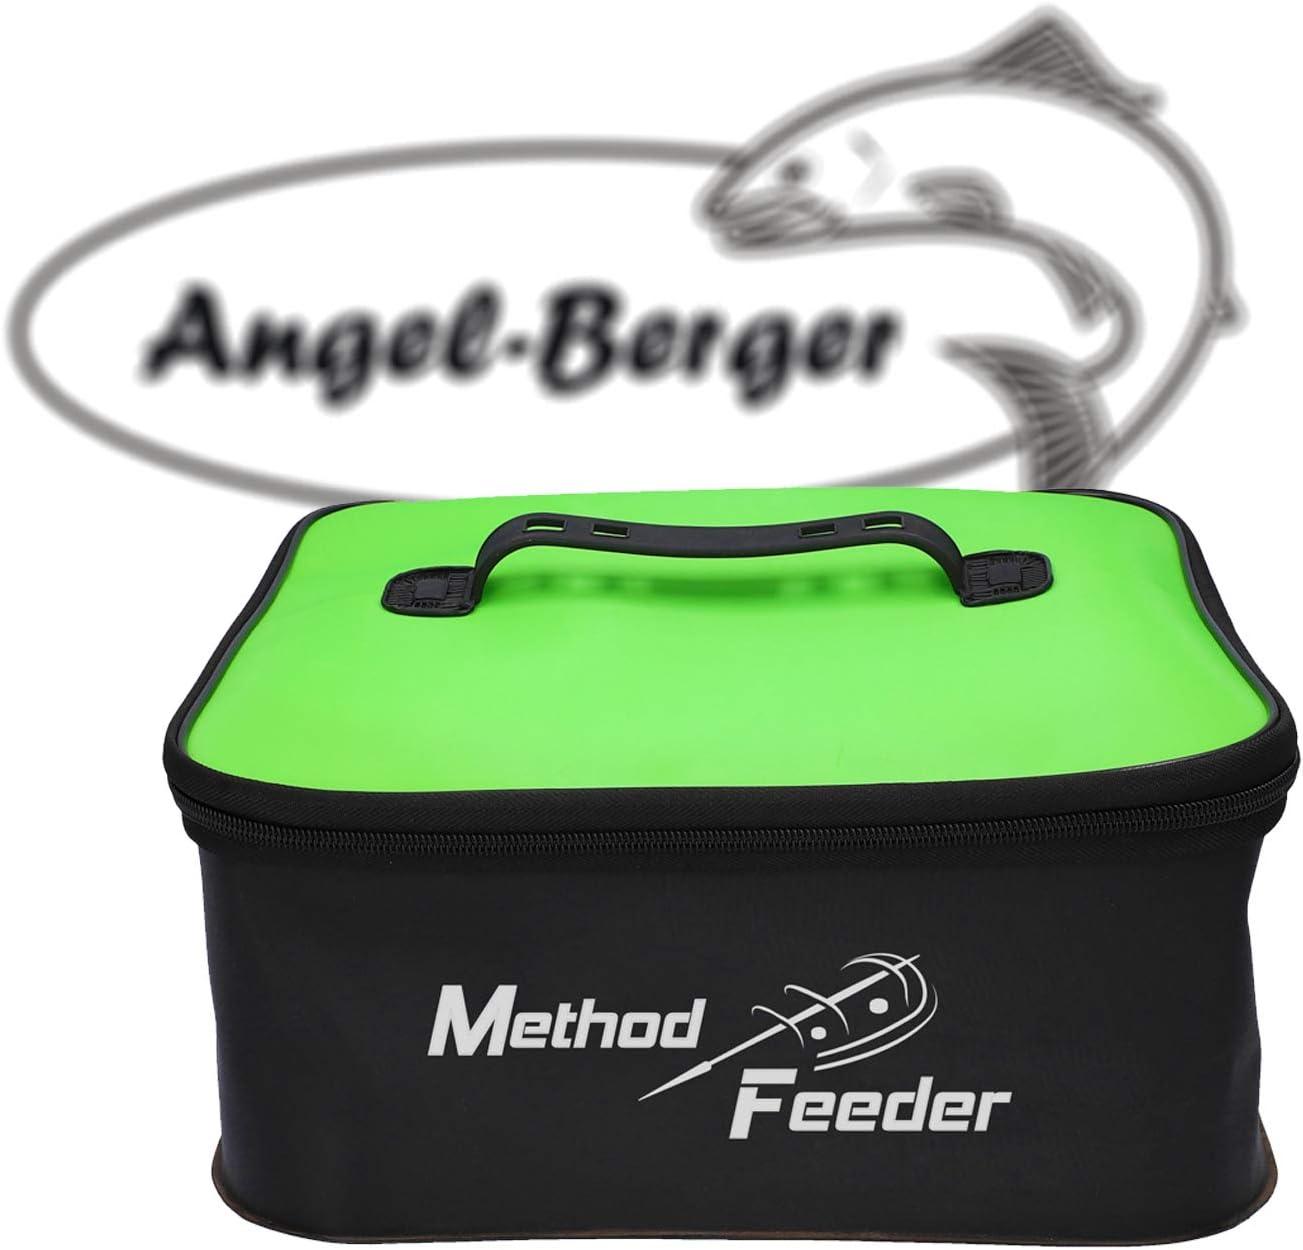 Angel-Berger Method Feeder Bag Eva Feedertasche Angeltasche Zubeh/örtasche K/ödertasche